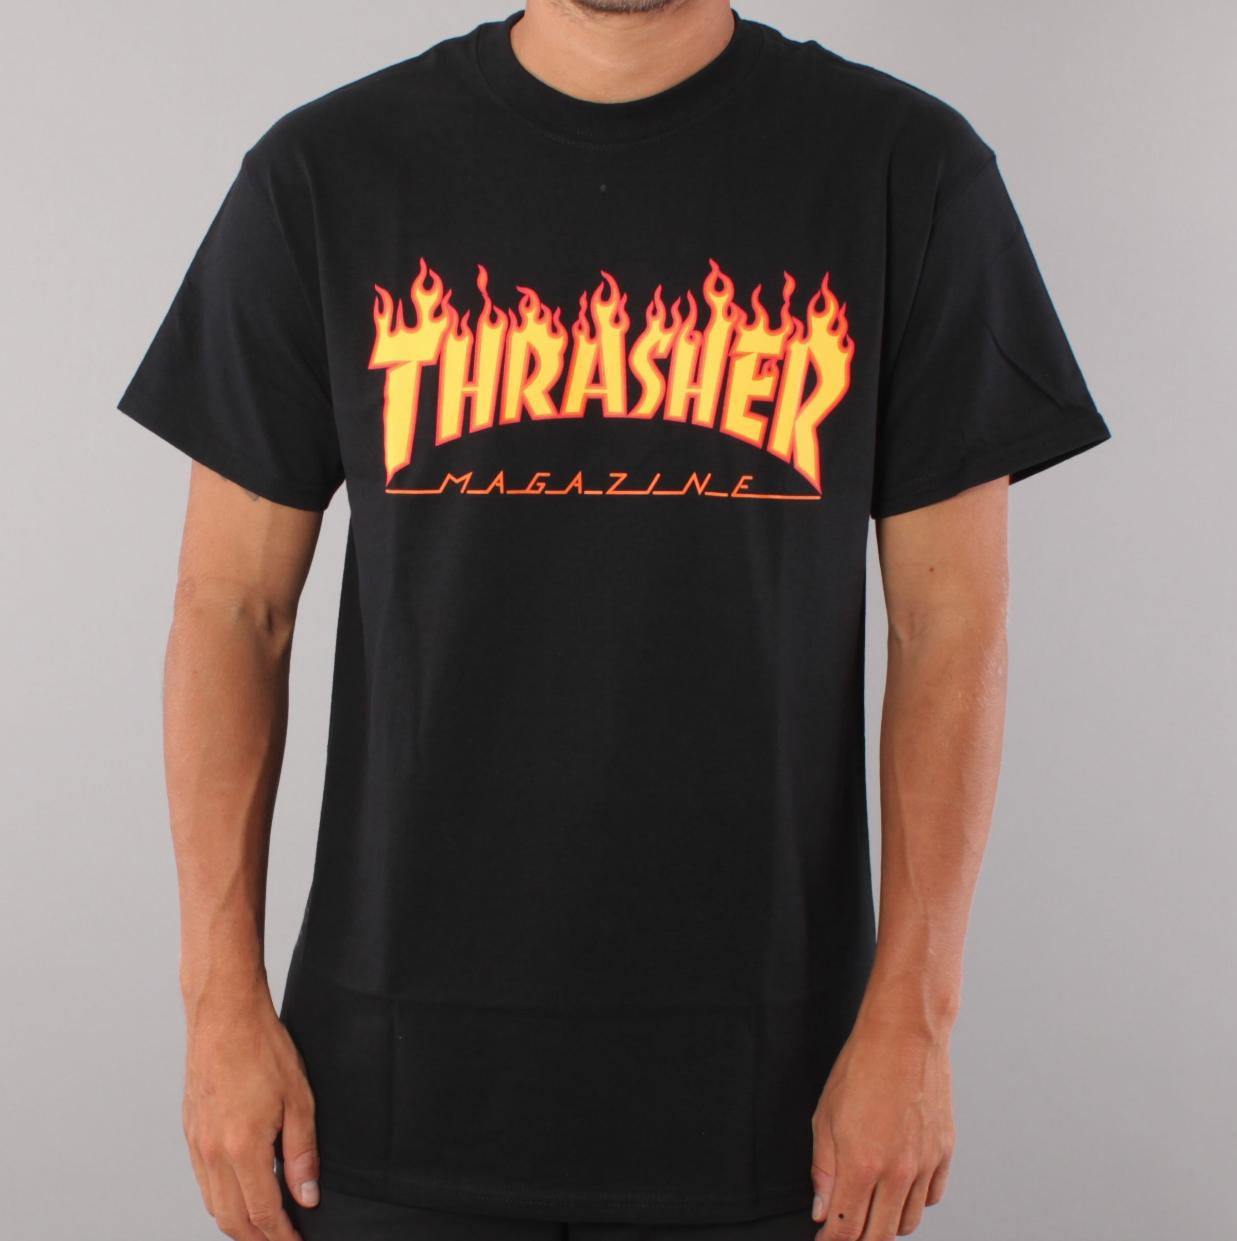 Thrasher Flame Youth T-shirt - Black